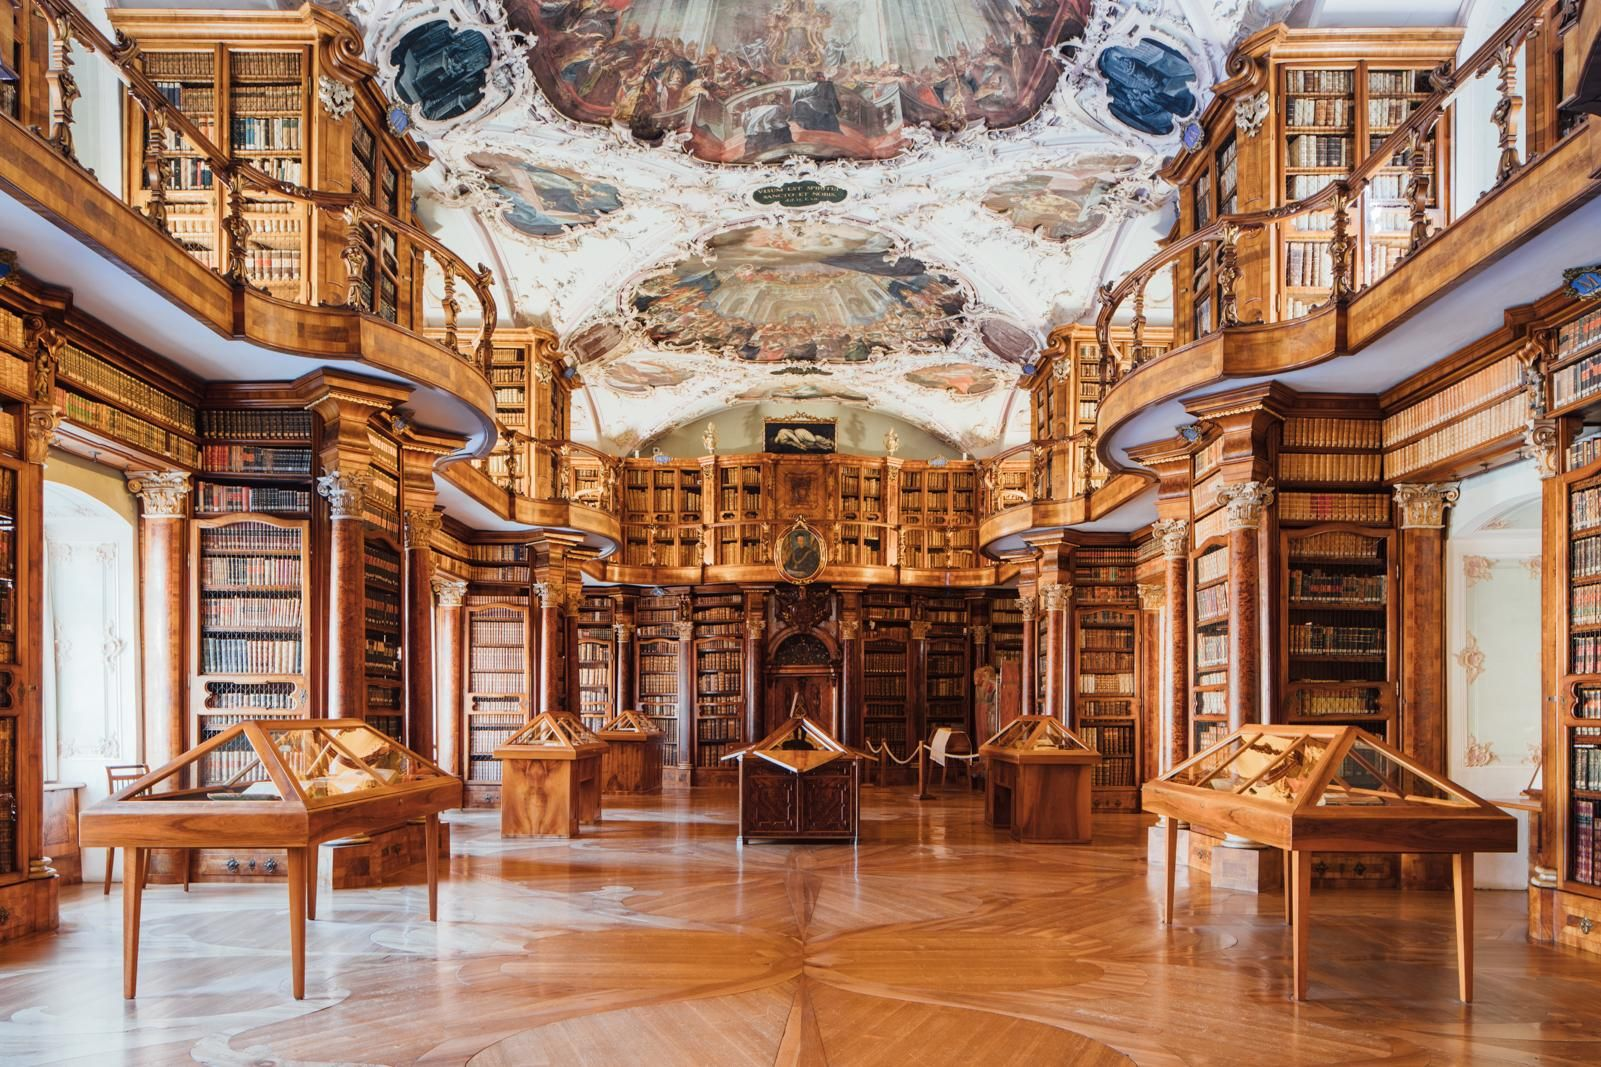 Abbey library of Saint Gall St Gallen Switzerland [1601x1067][OC ...